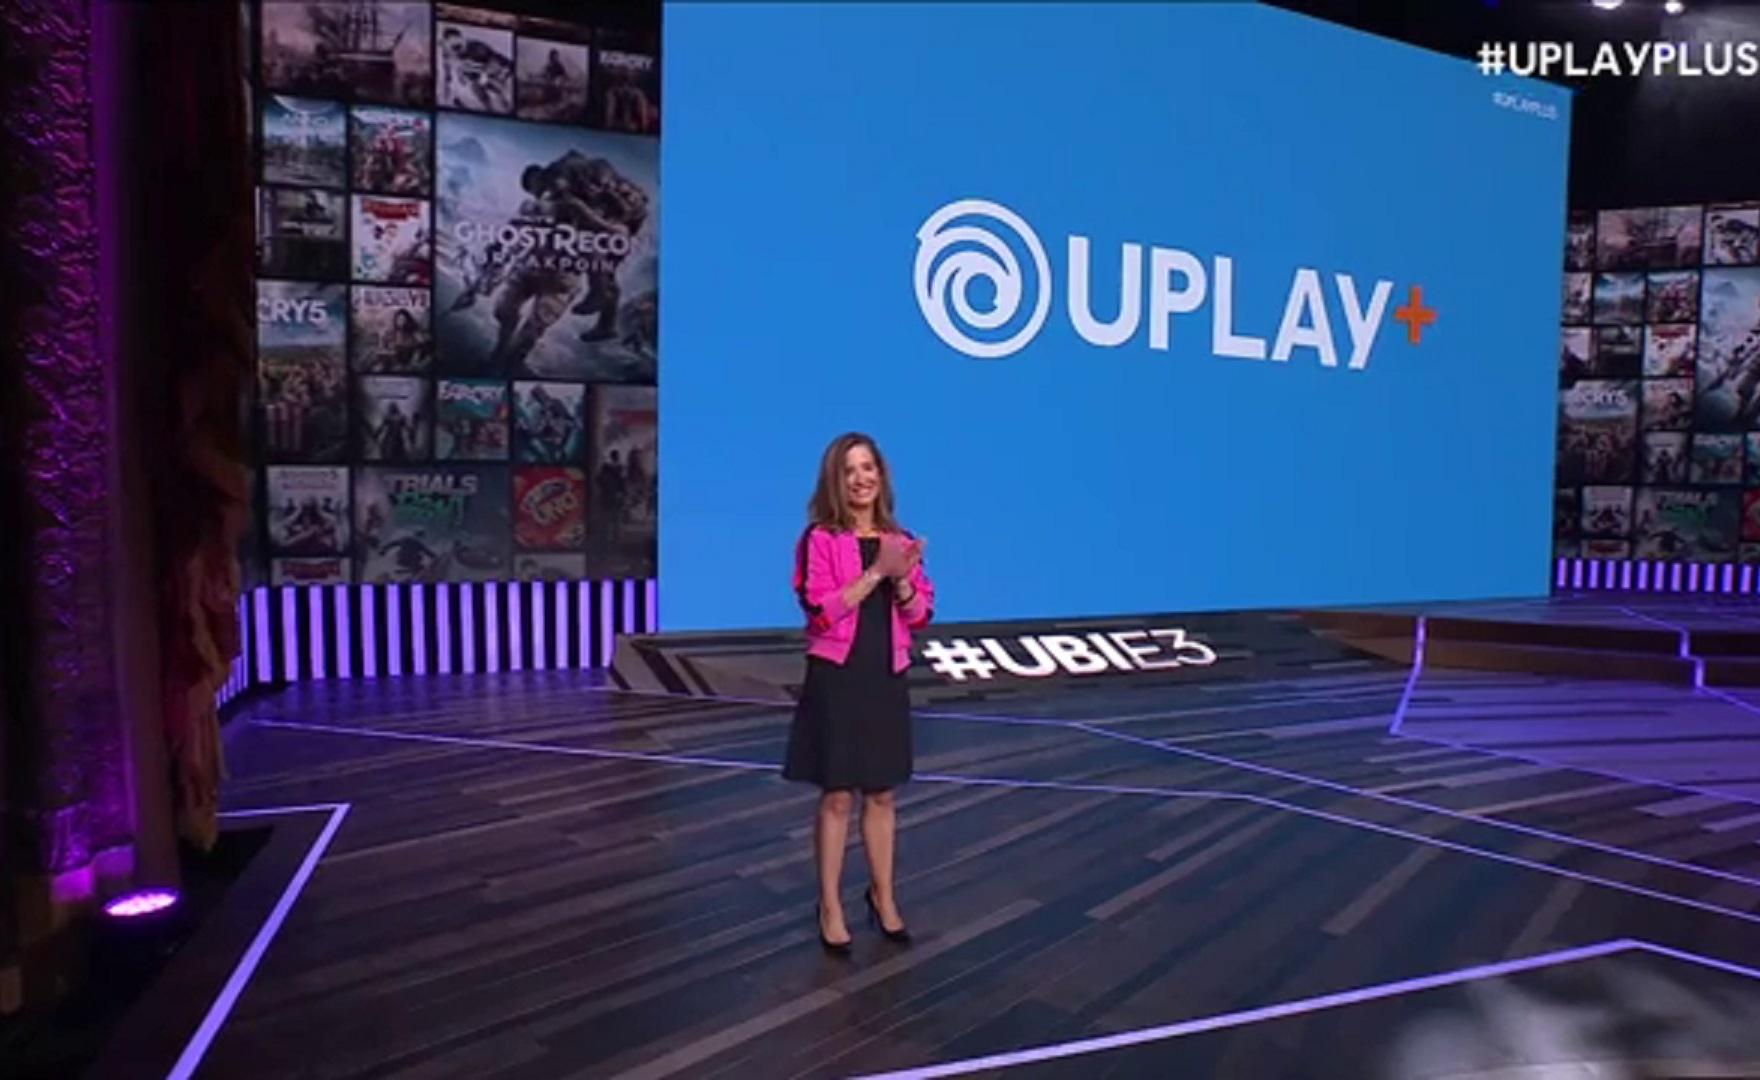 Uplay+: la vera mossa vincente di Ubisoft?